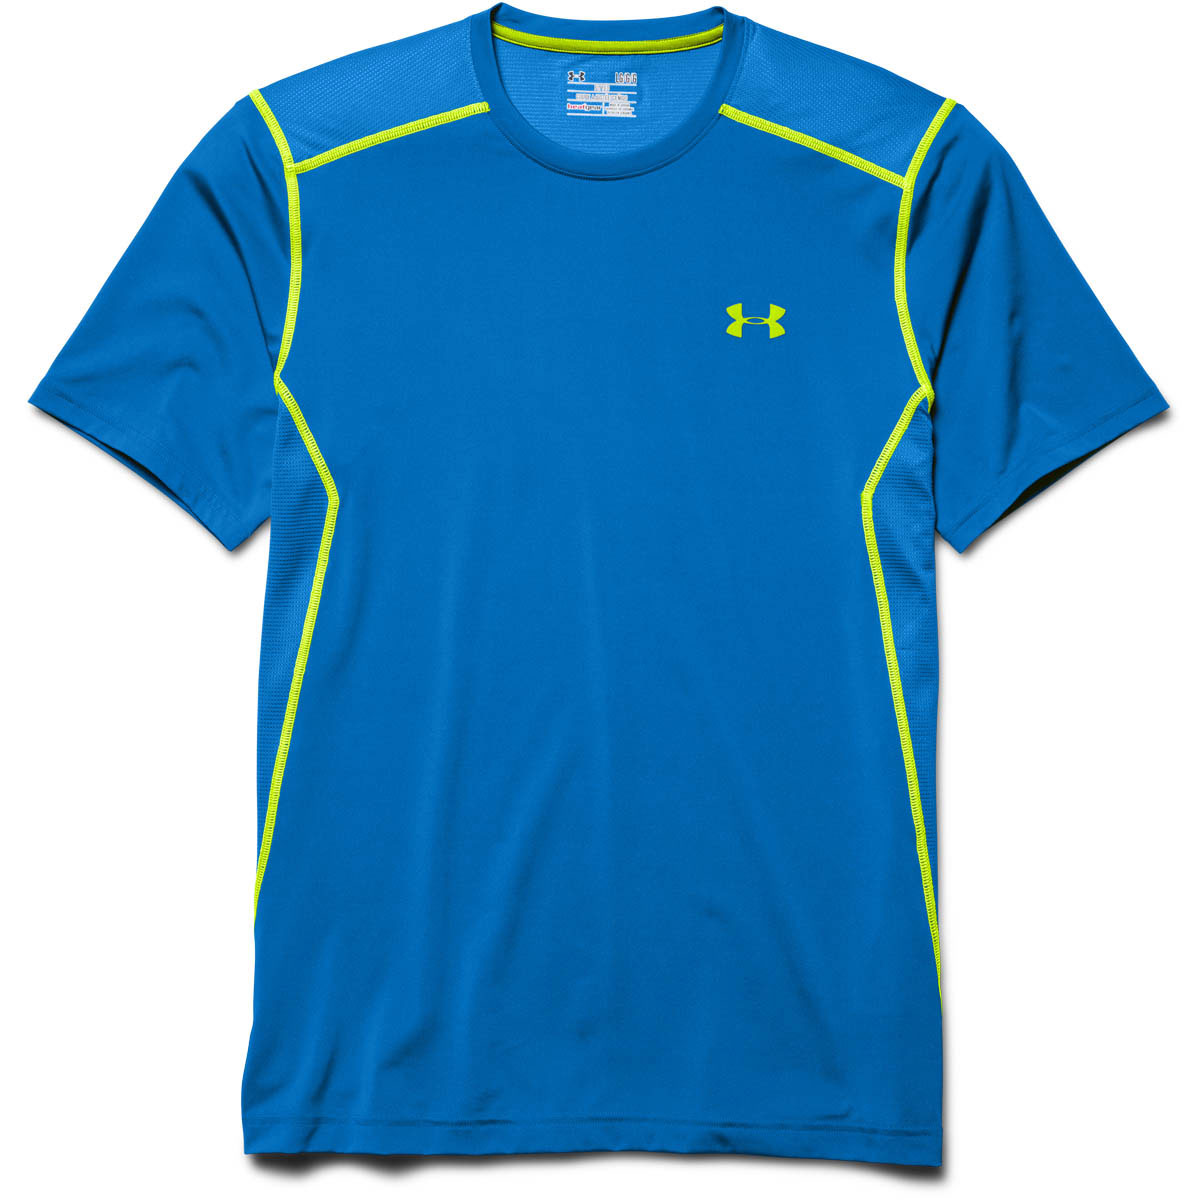 Under-Armour-Mens-UA-Raid-Short-Sleeve-T-Shirt-Crew-Neck-Performance-Tee